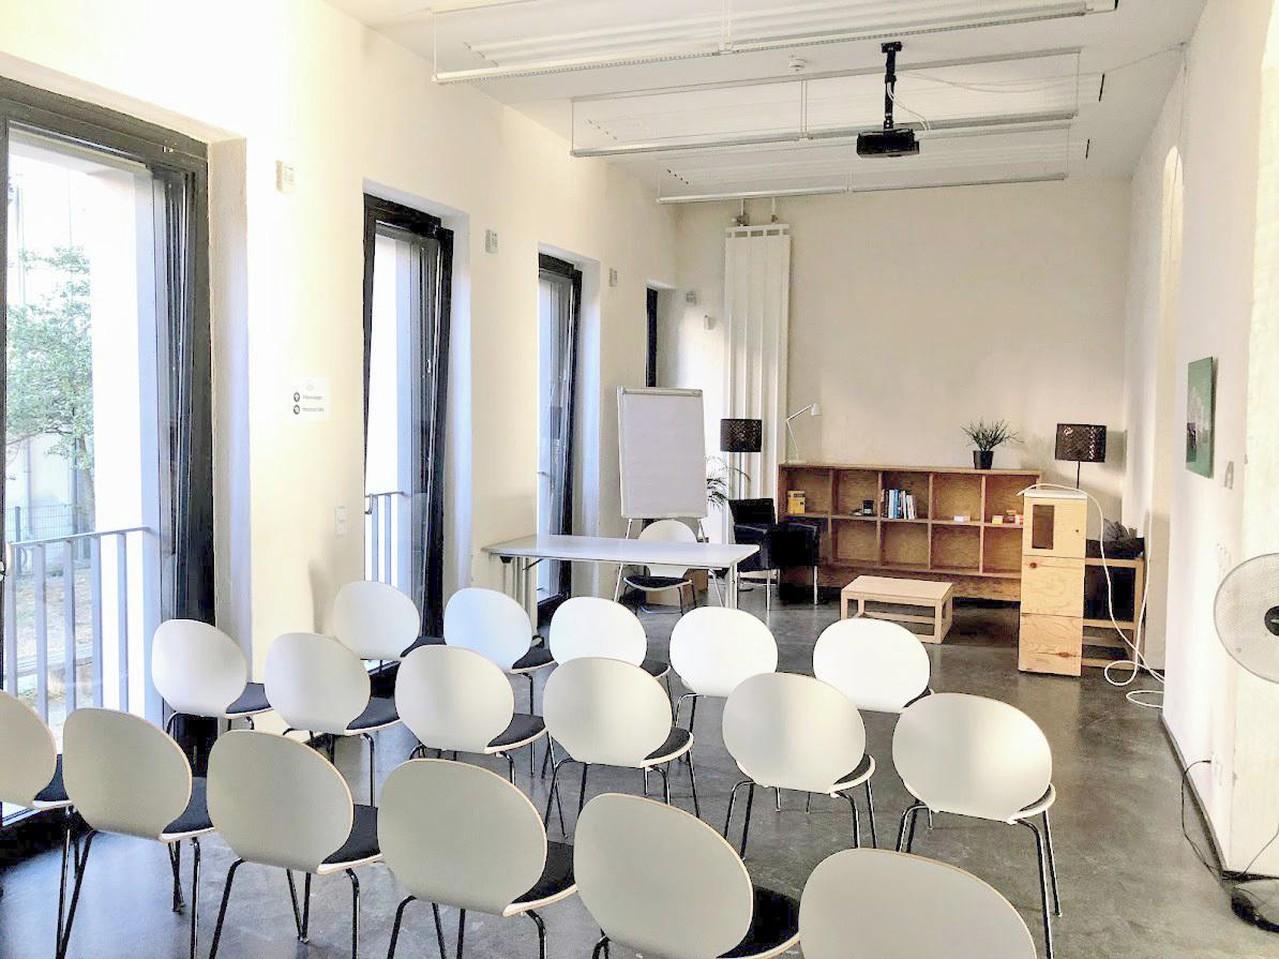 Leipzig training rooms Salle de réunion Kilimanjaro image 0